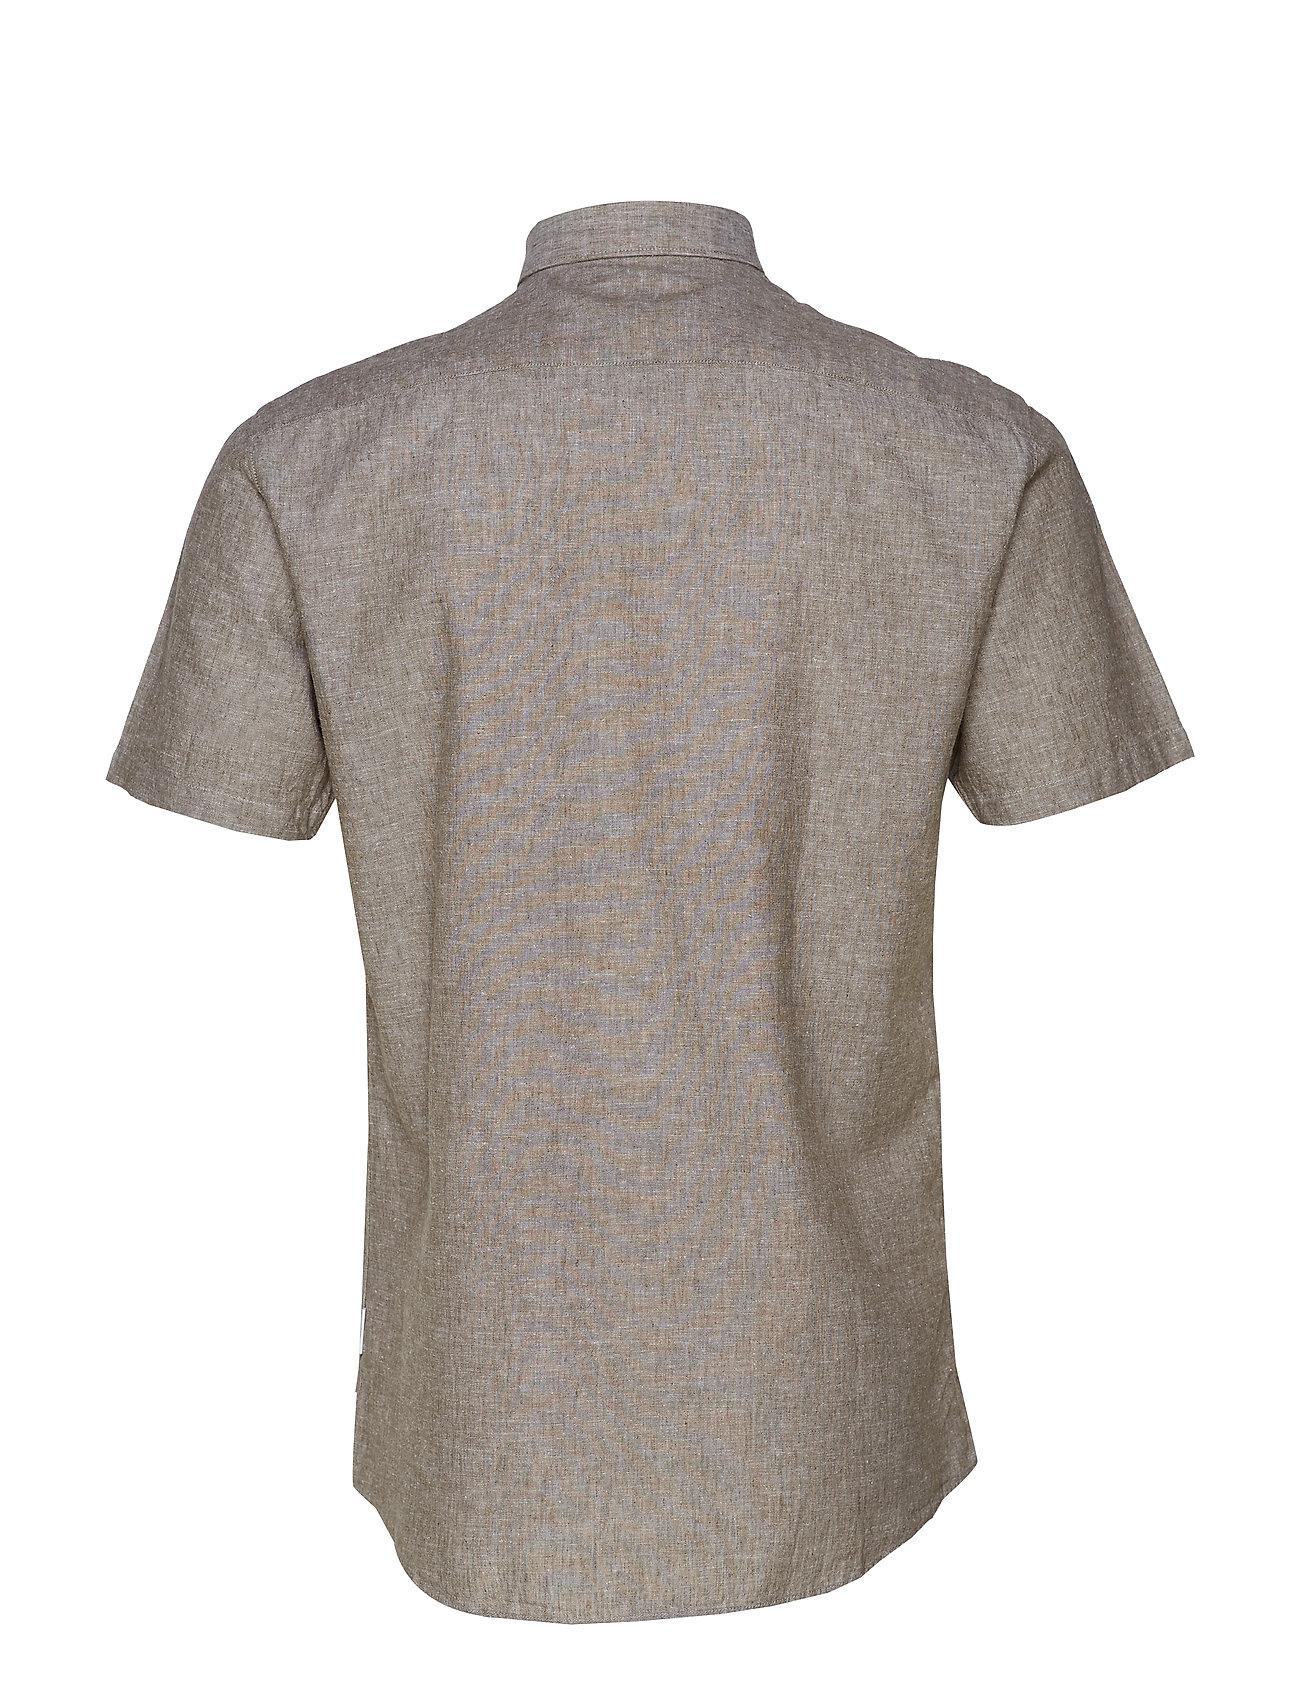 S Shirt S sarmyLindbergh Linen S Linen Cotton Cotton Shirt Linen Shirt sarmyLindbergh Cotton WH2ID9YEeb